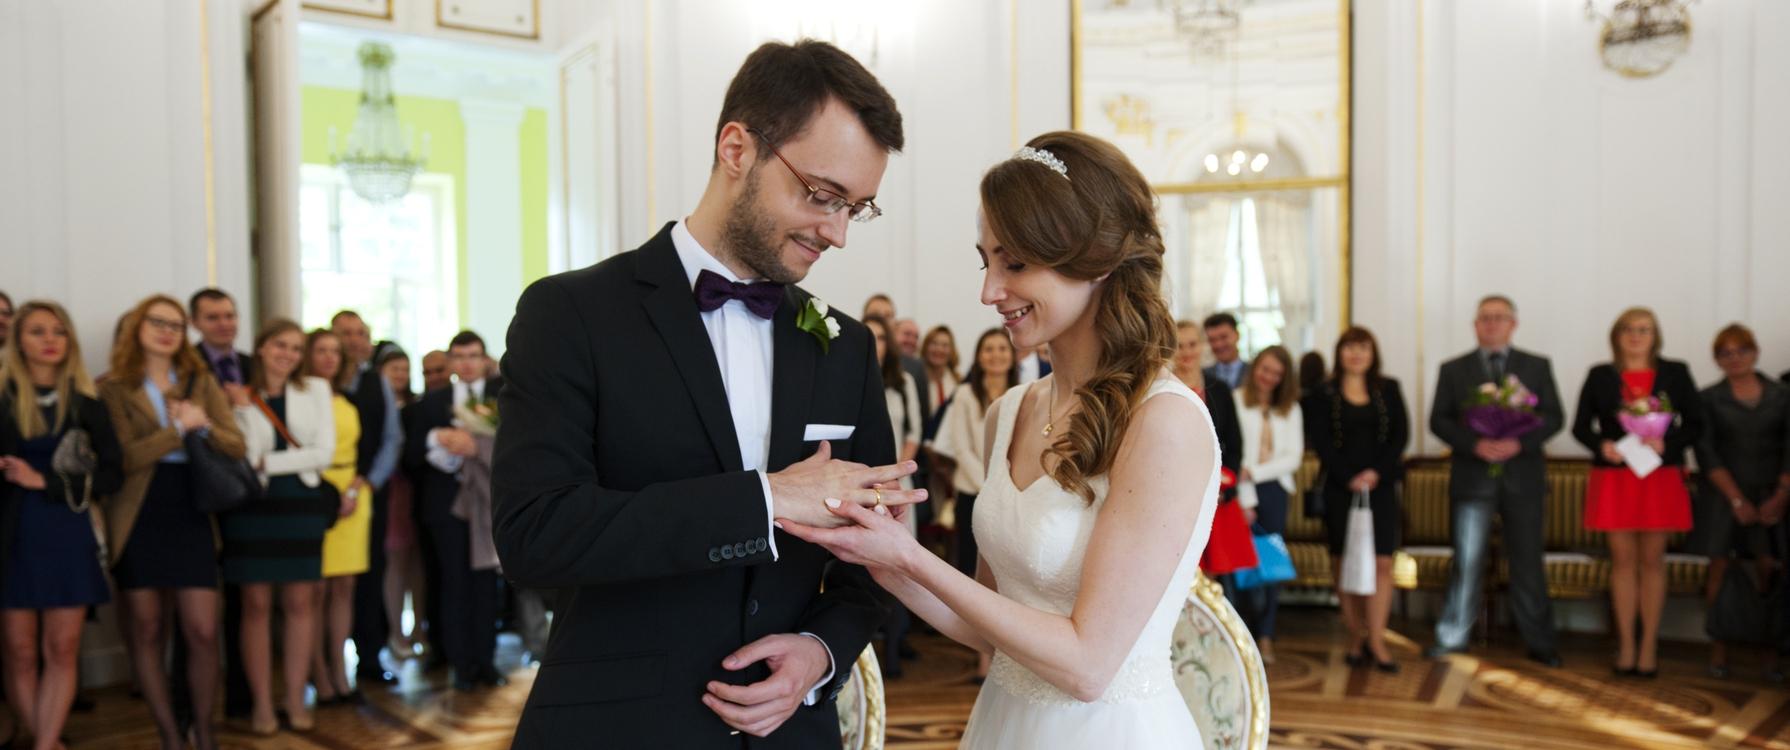 Ślub Uli i Kacpra